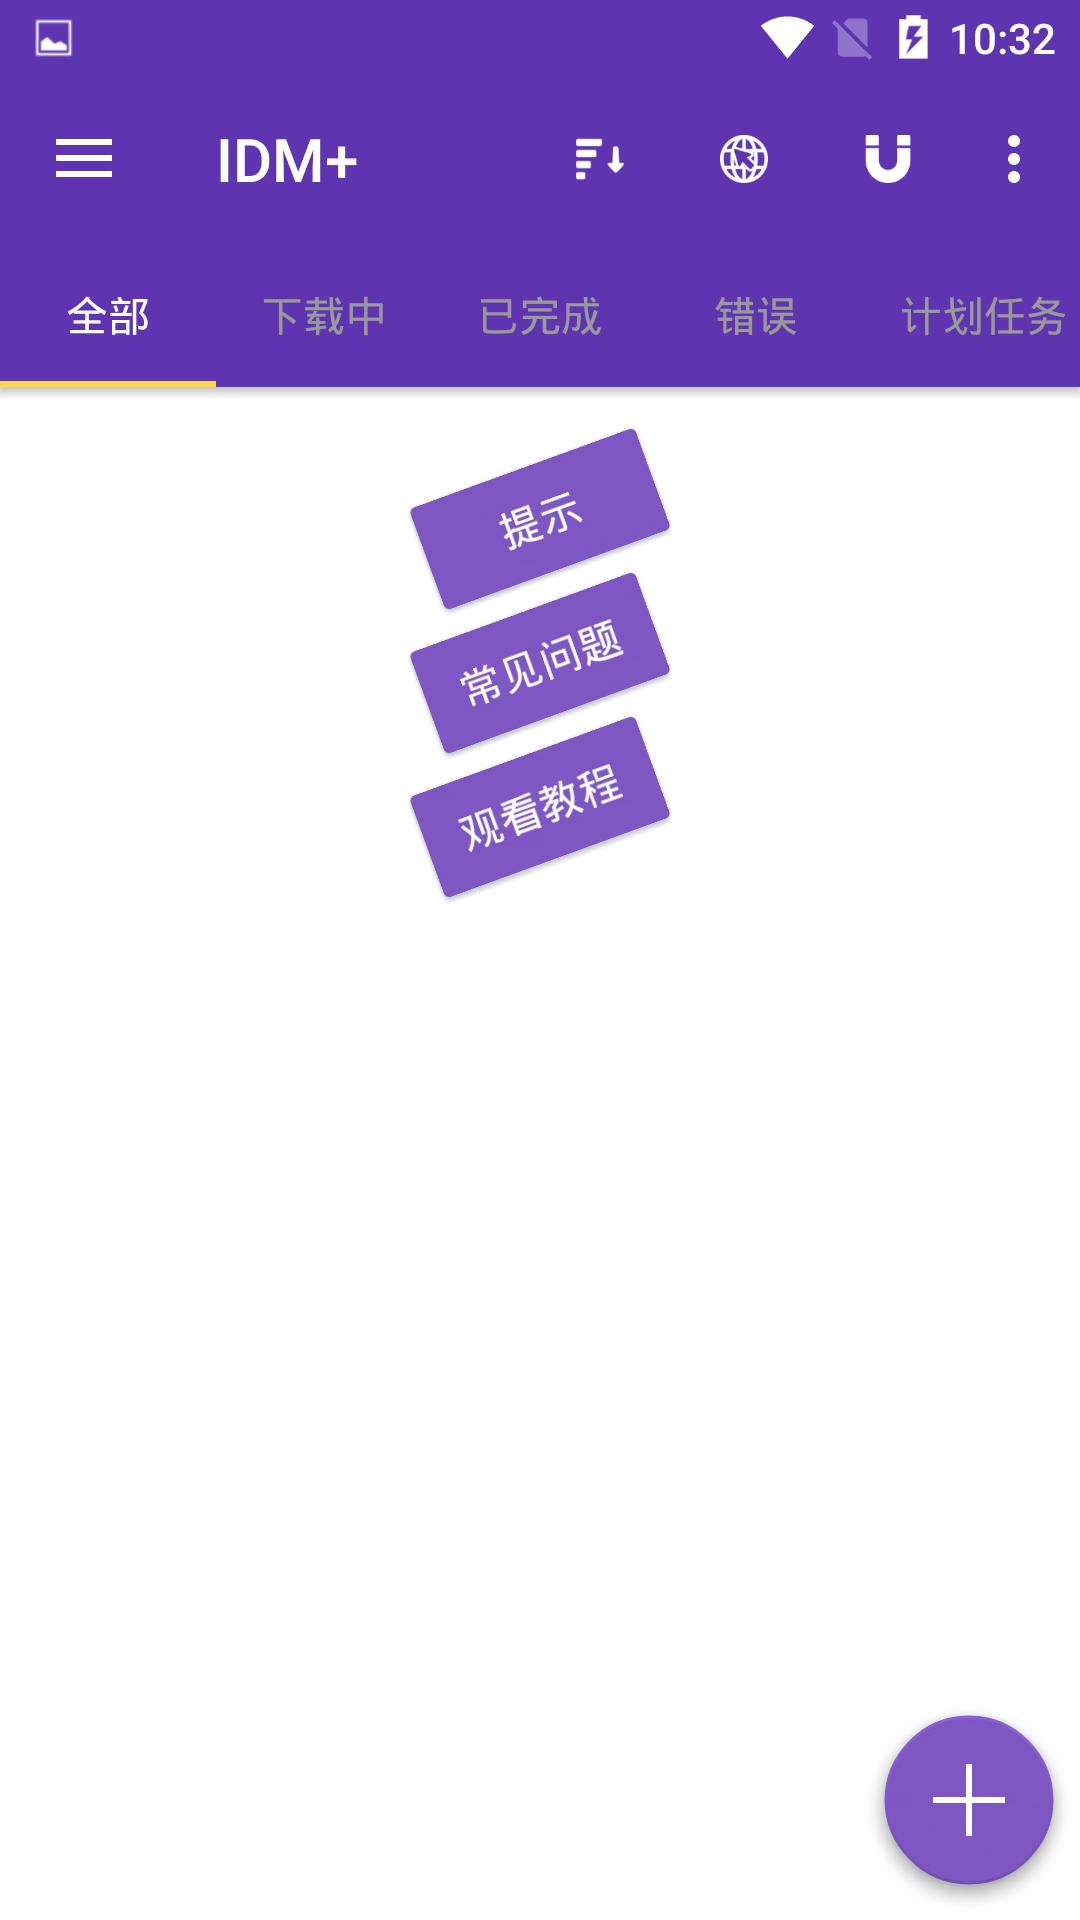 Screenshot_2020-03-23-22-32-06.png